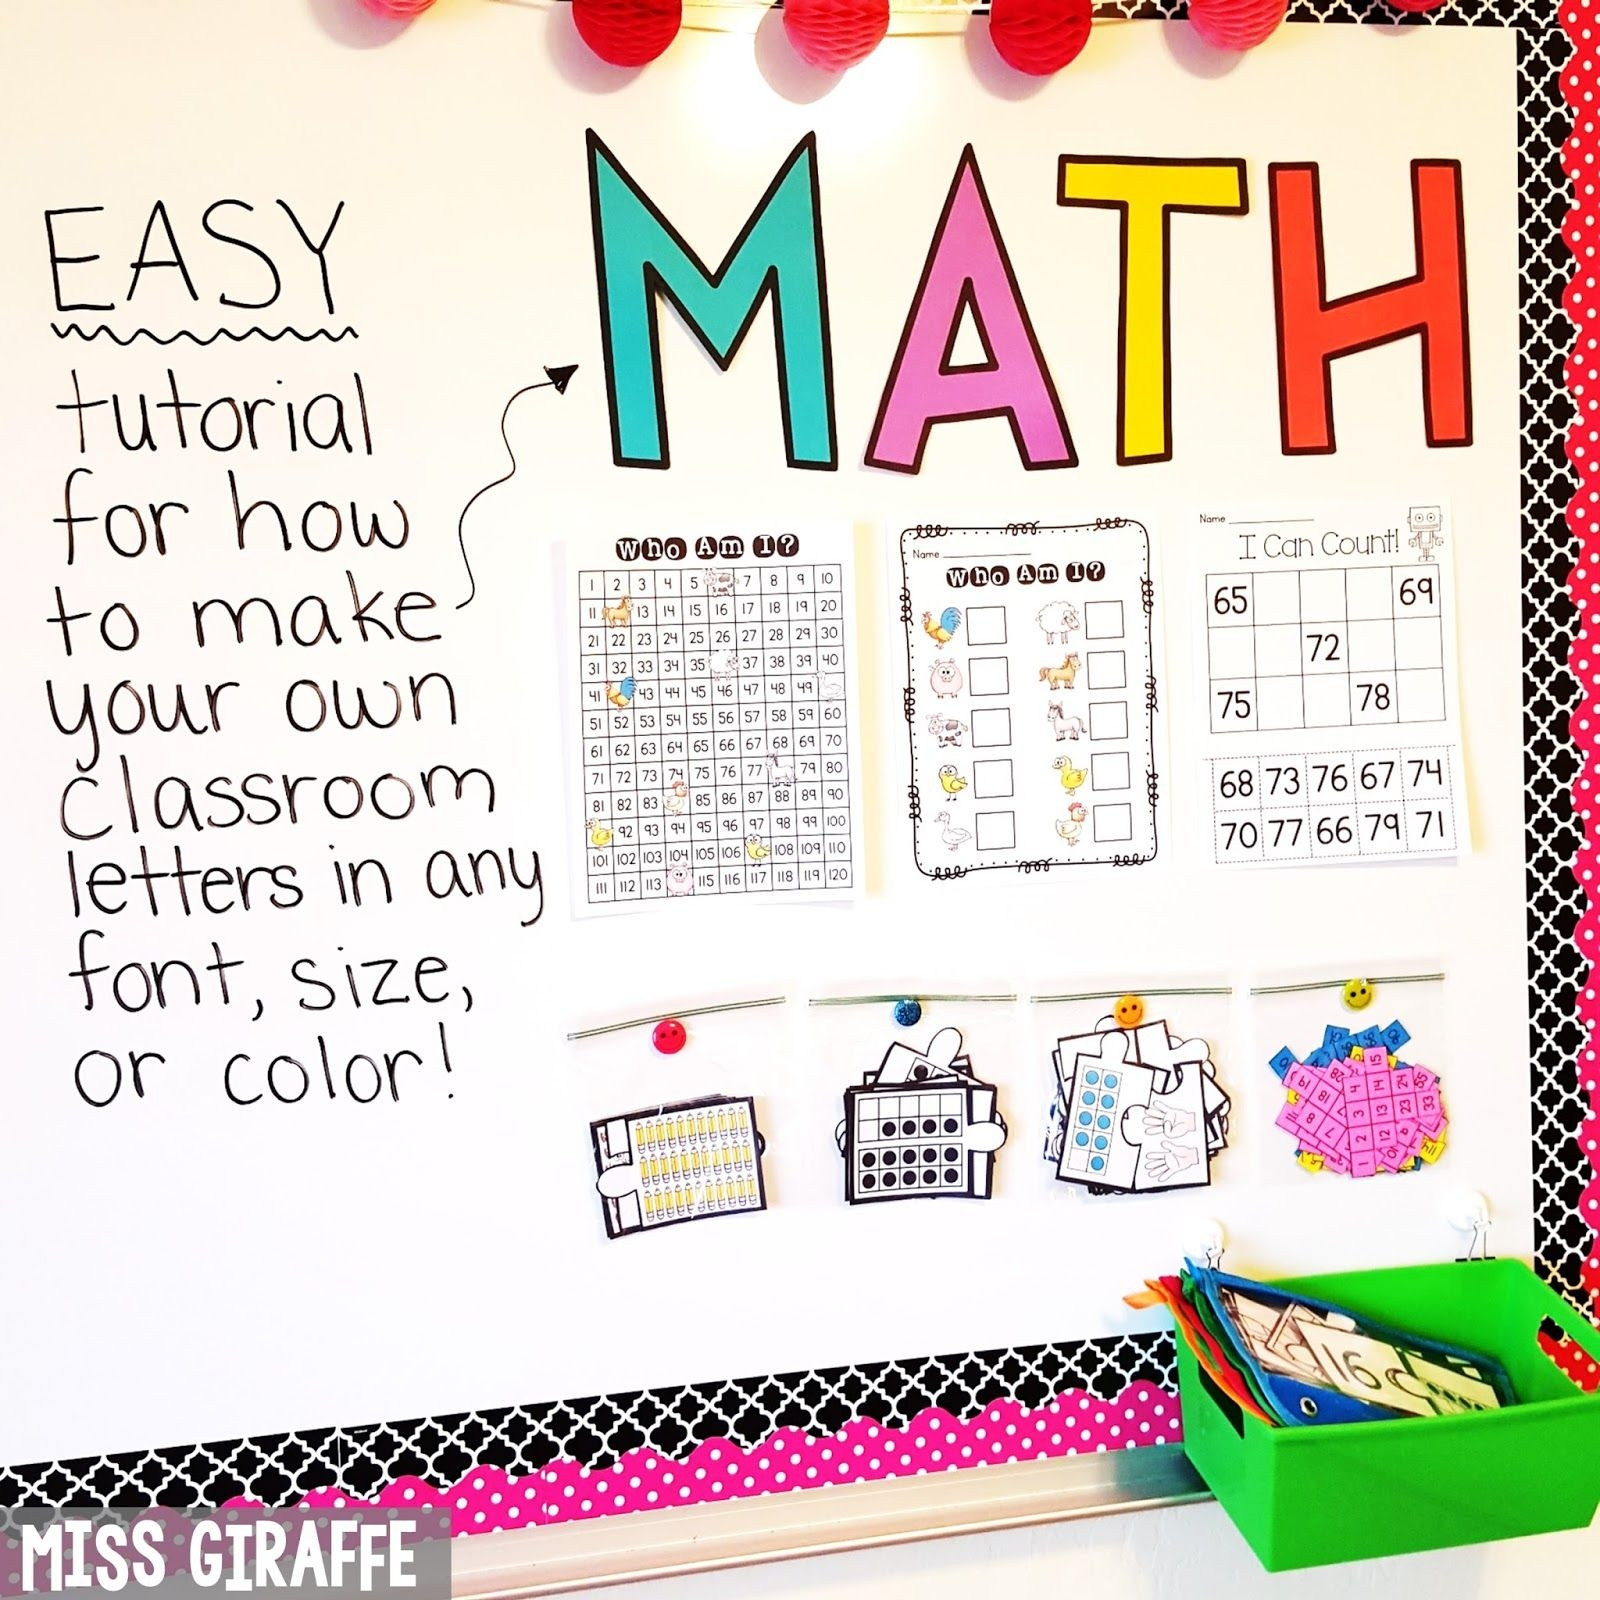 Miss Giraffe's Class: Diy Classroom Decor Bulletin Board Letters